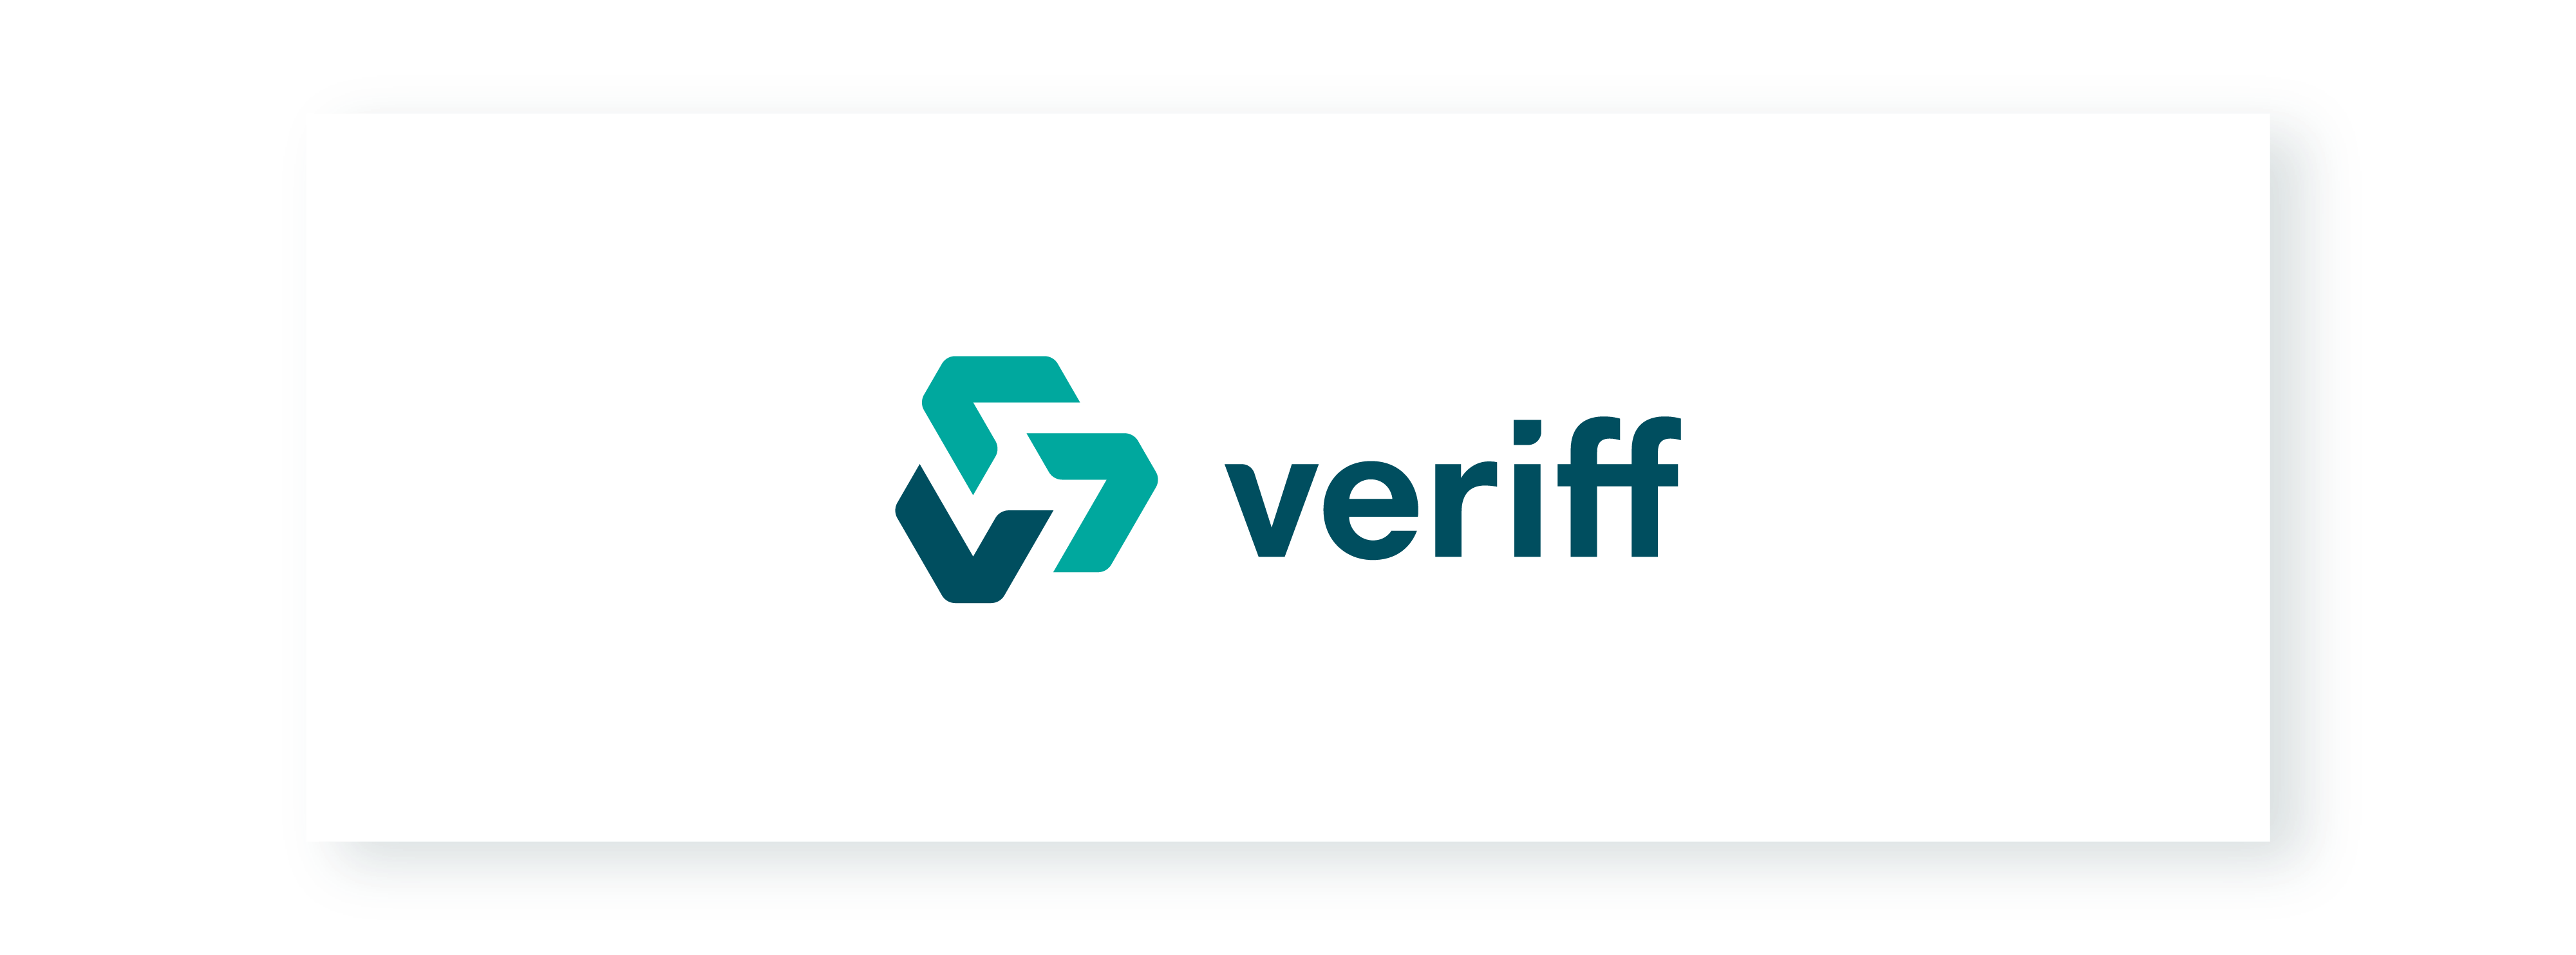 Veriff logo